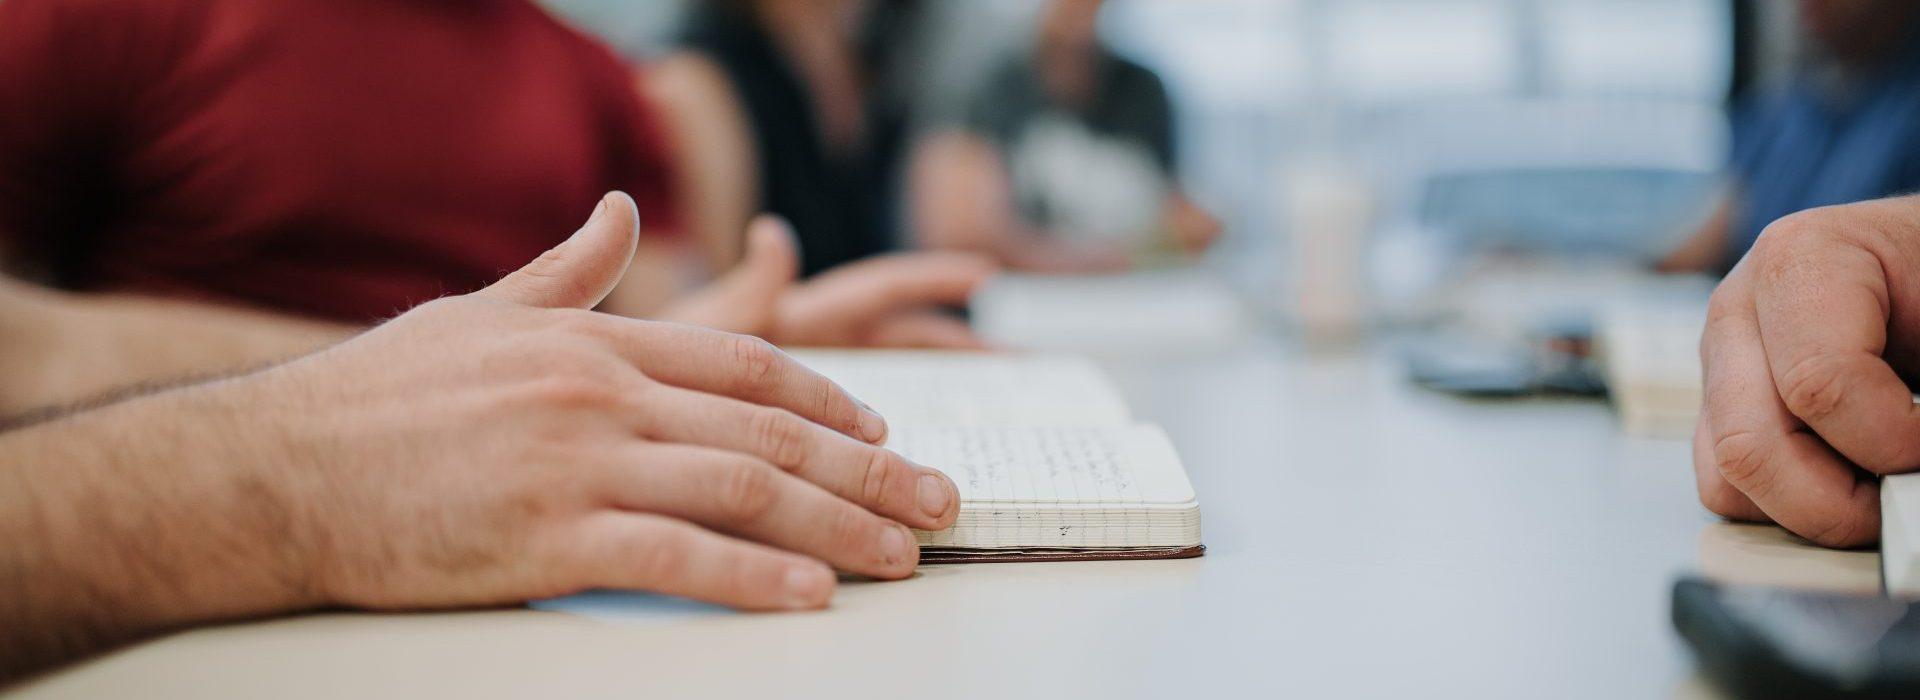 faith in God's Word, hands on Bible